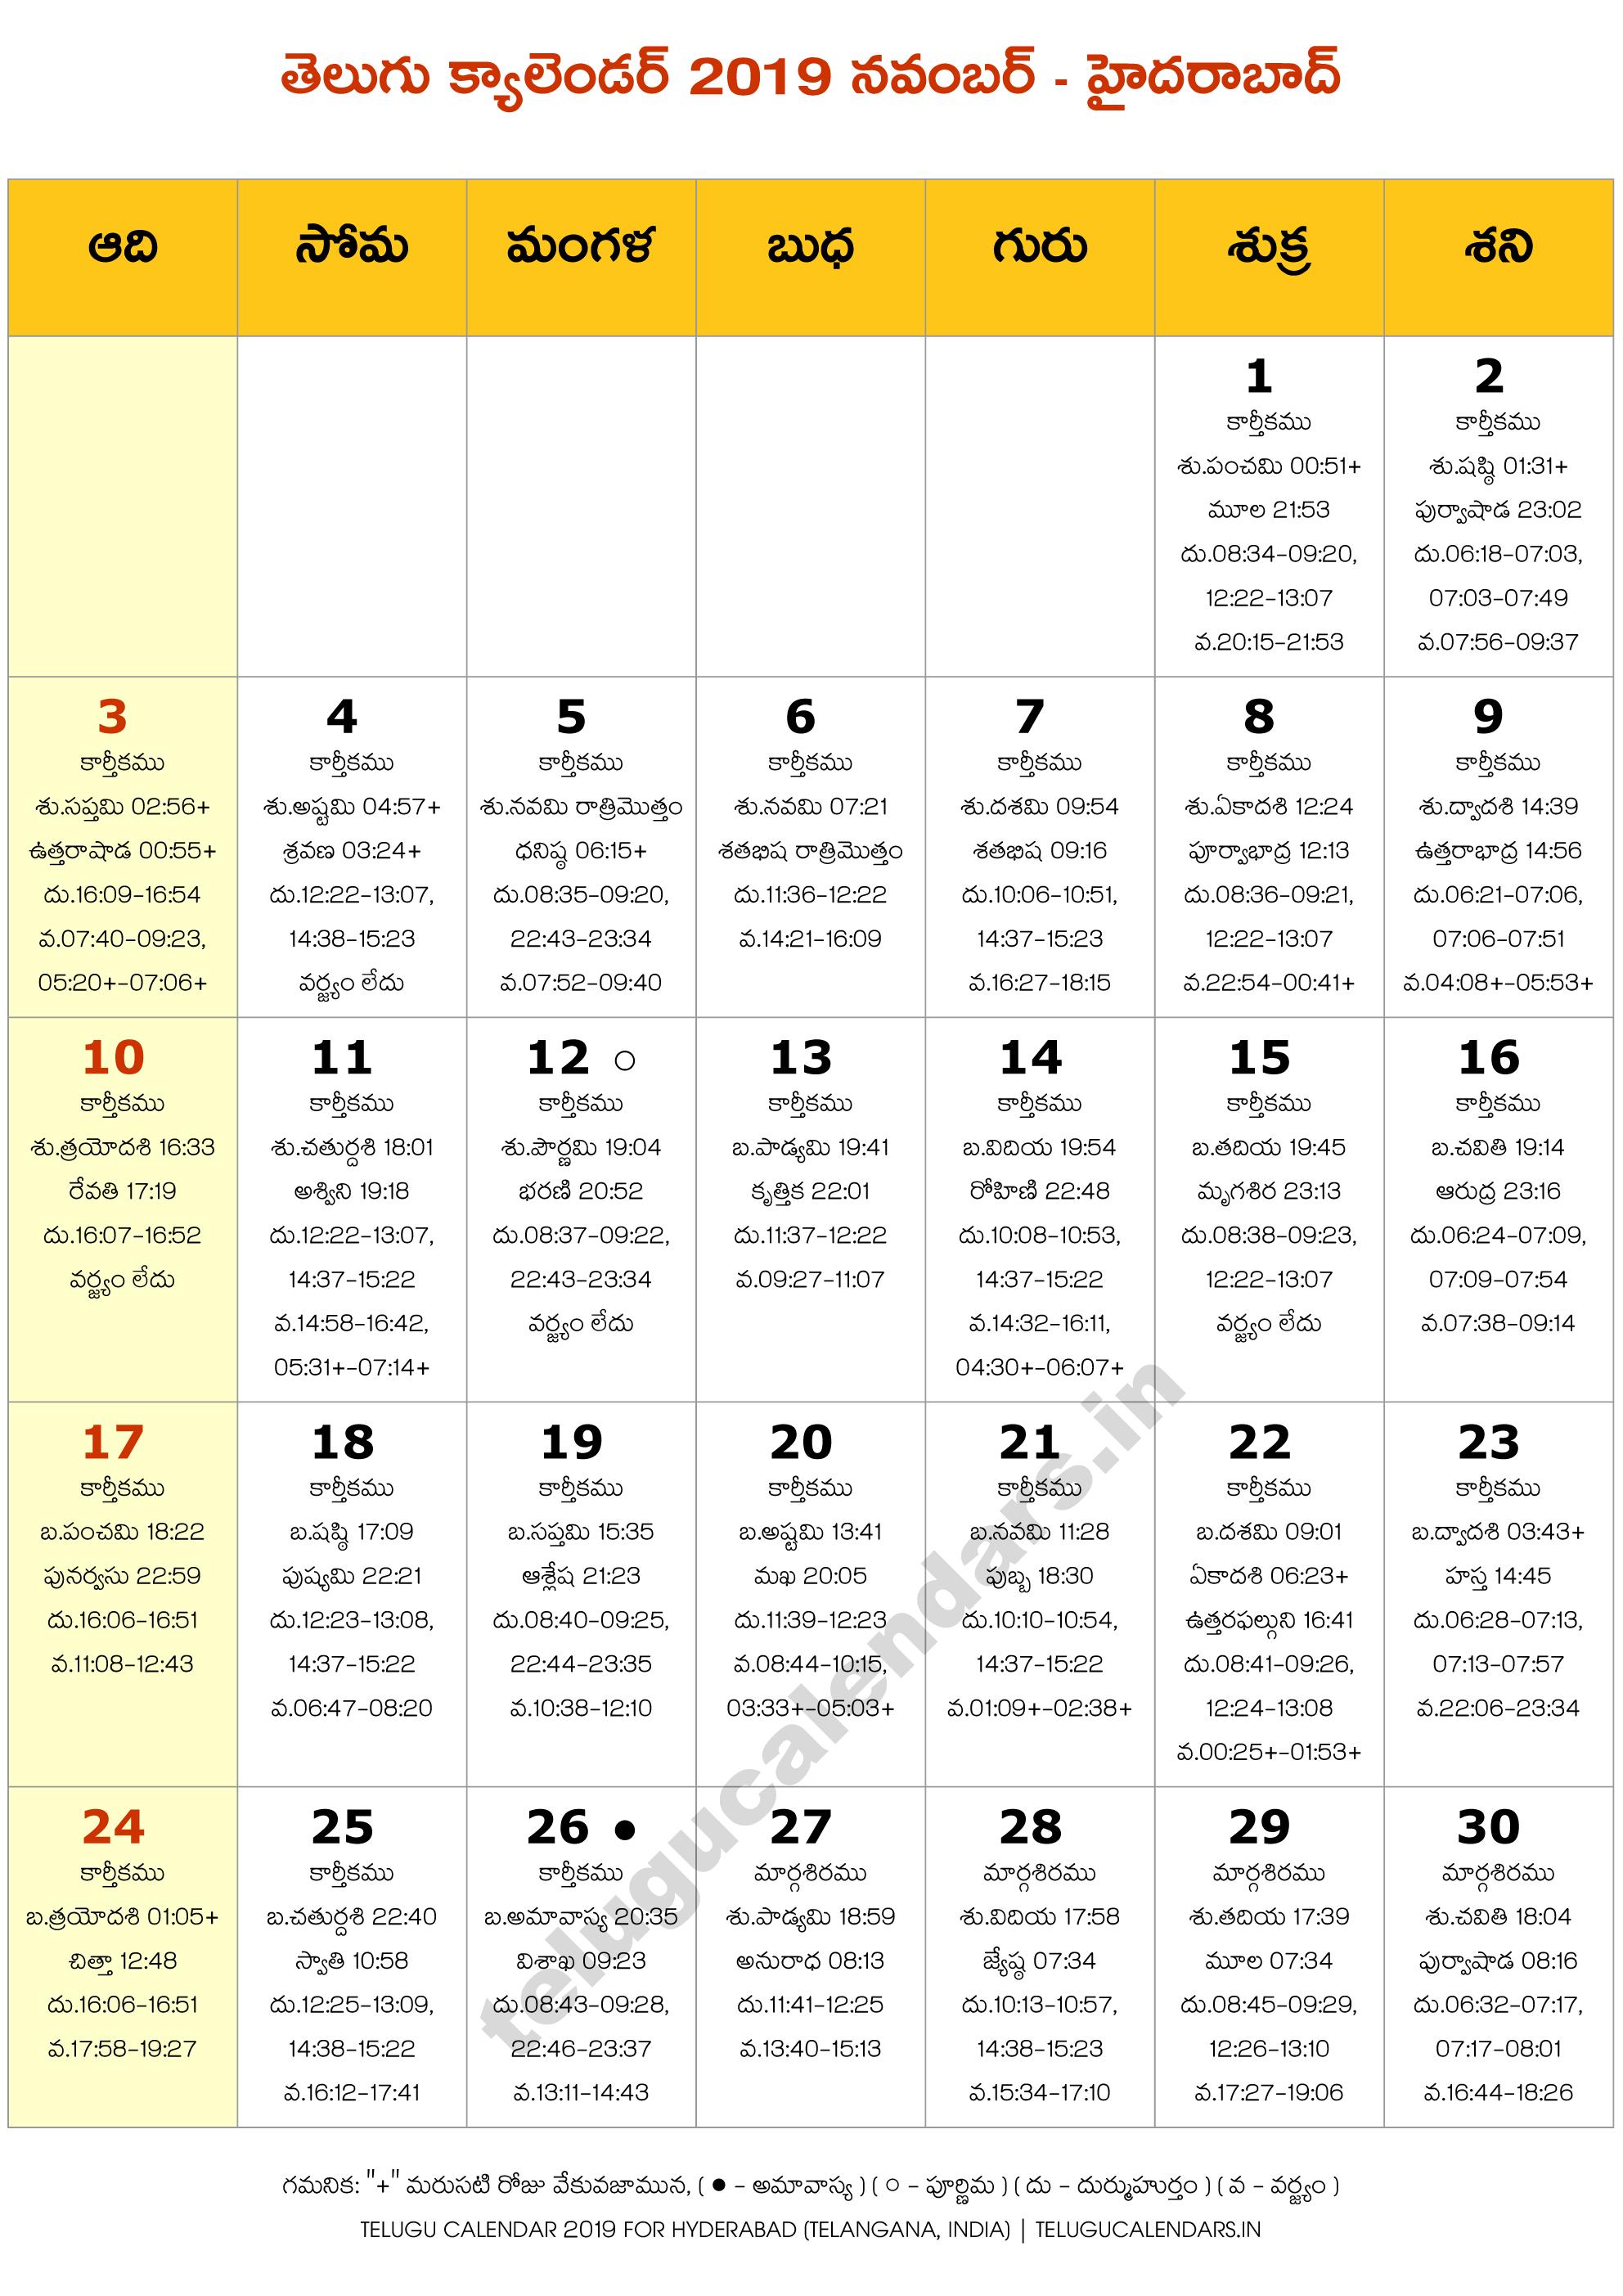 Hyderabad 2017 June Telugu Calendar Telugu Calendars - Imagez co